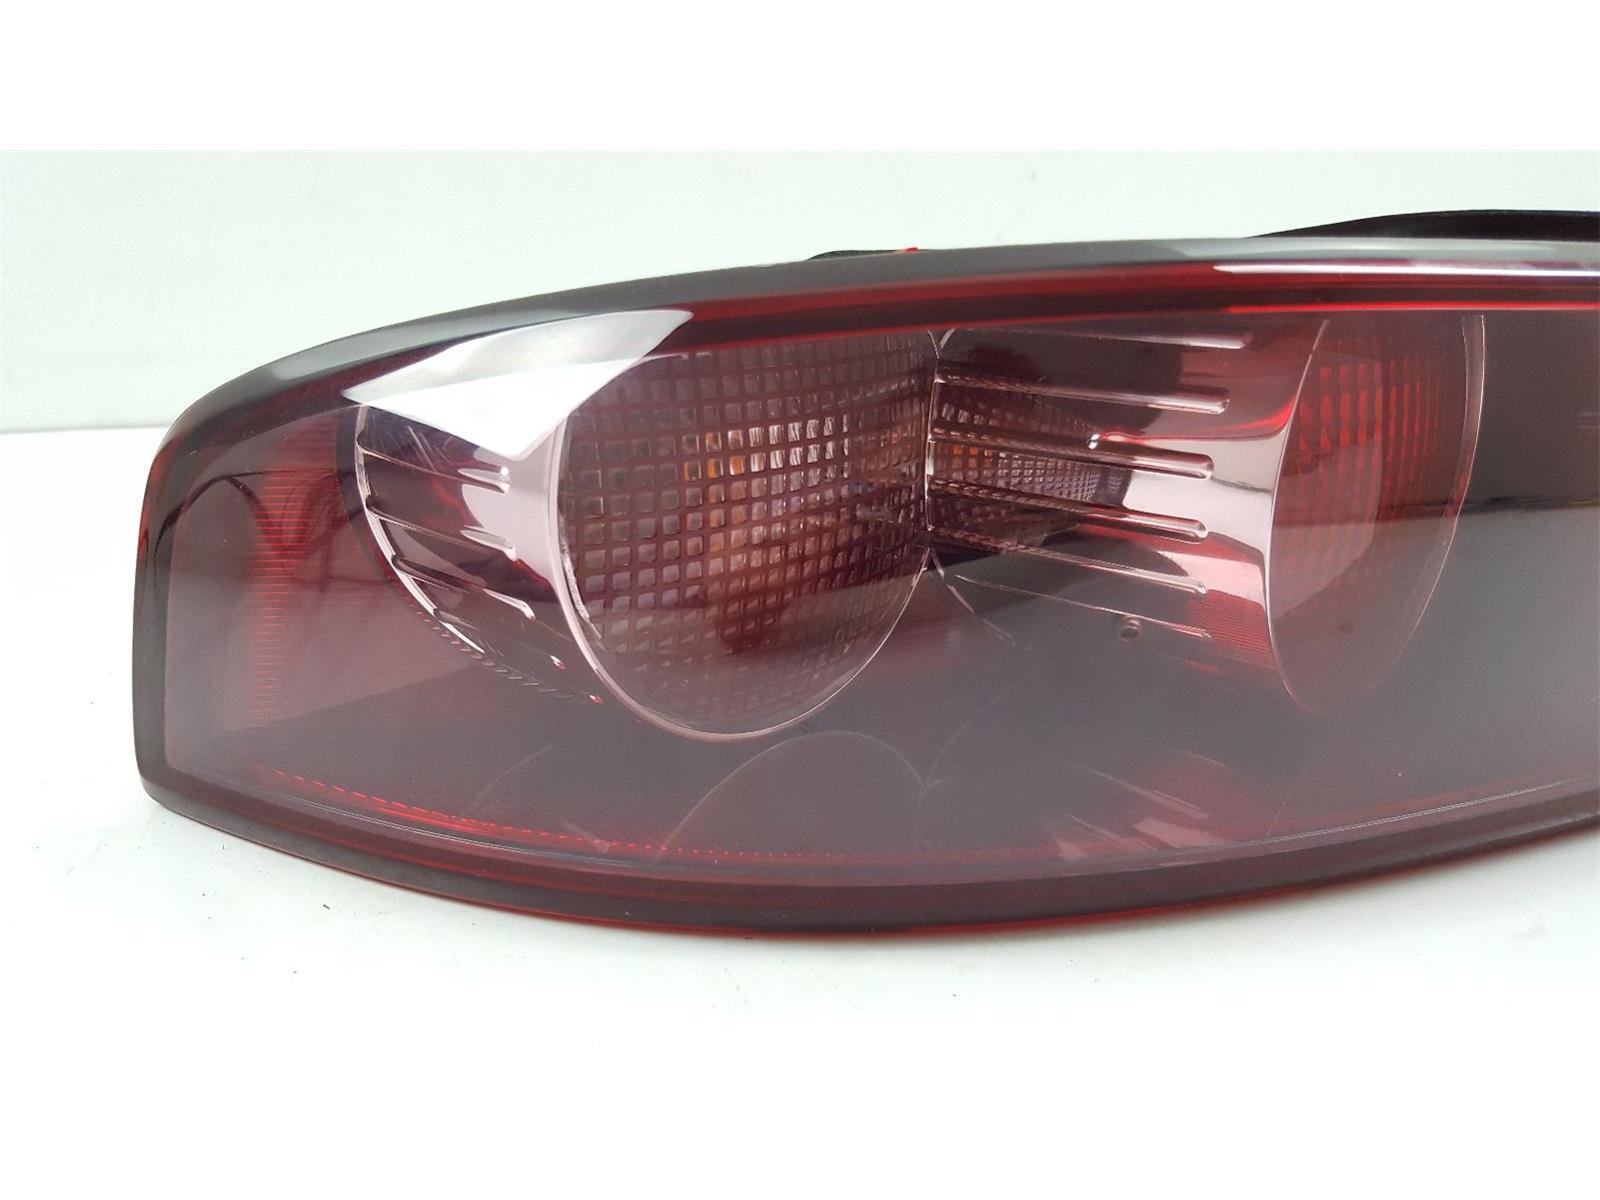 Alfa Romeo 159 2006 To 2009 Lamp Assembly Rear Lh Petrol Manual Tail Lights Mk1 Light Ns Passenger Side 4 Door